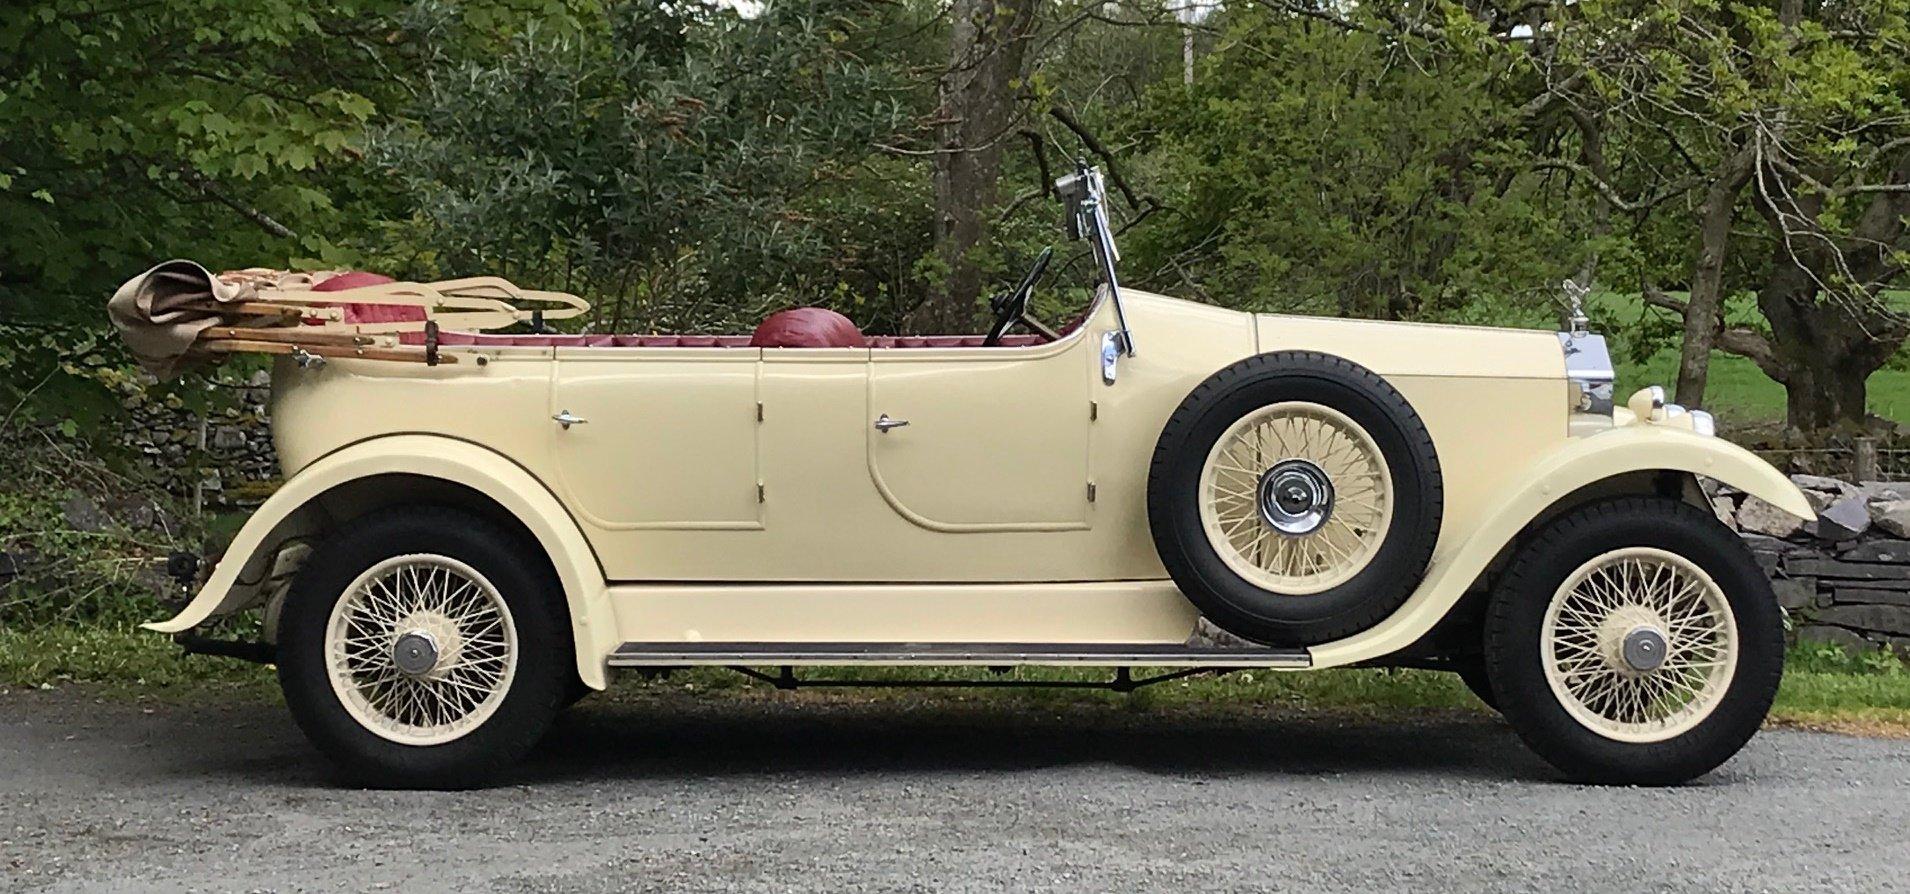 1925 Rolls-Royce 20hp Horsfield Open Tourer GPK4 For Sale (picture 3 of 6)